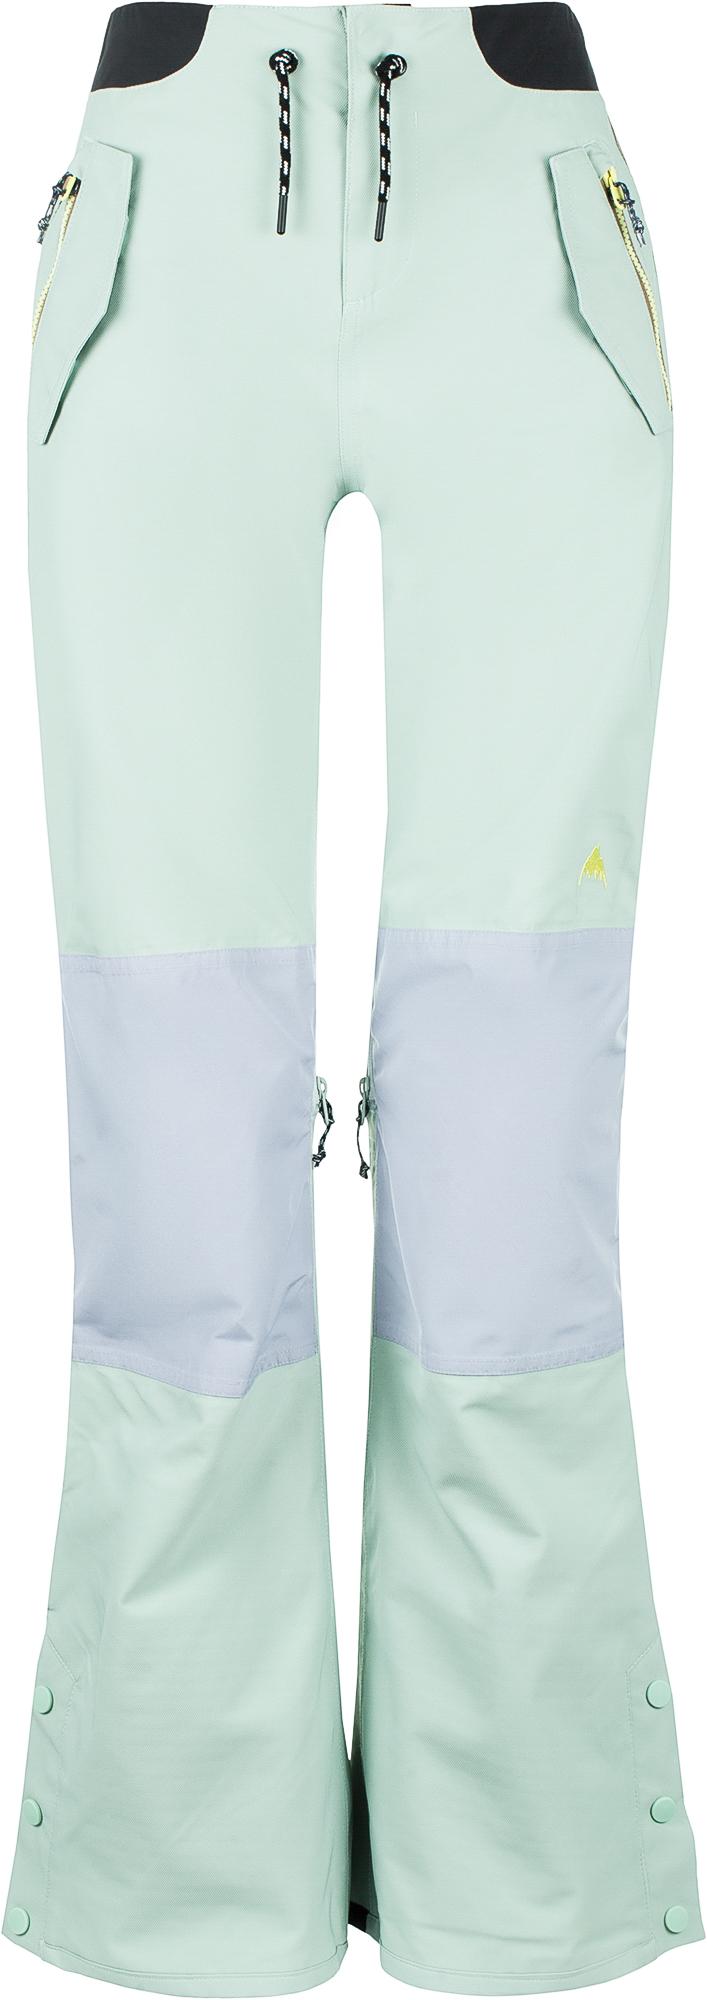 Burton Брюки женские Burton Loyle, размер 48-50 burton брюки boys exile cargo pt